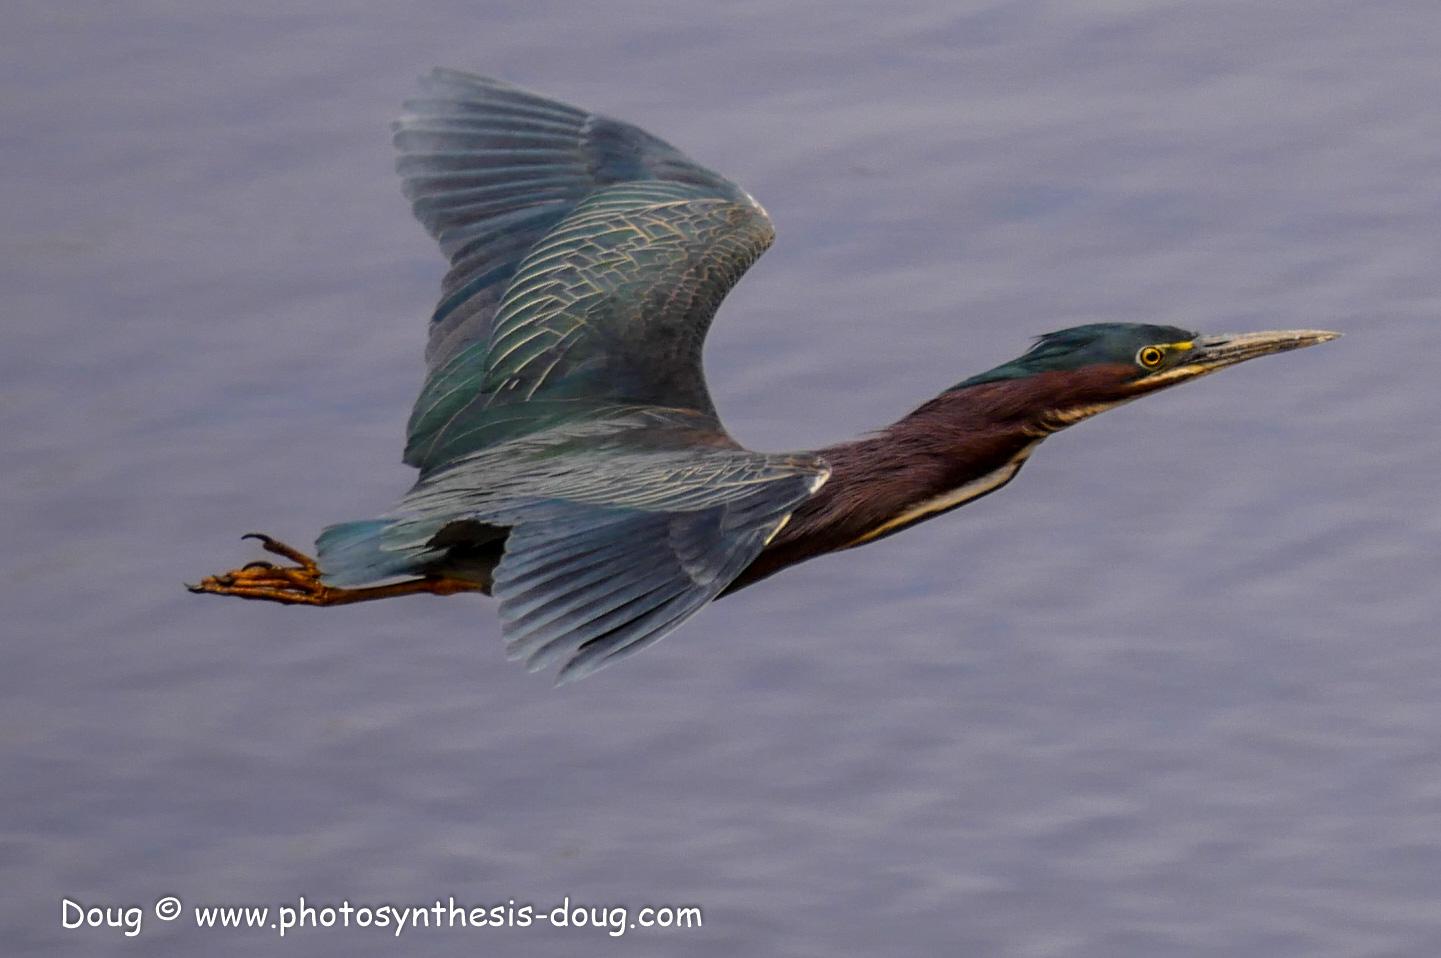 Merkle WLR April birds-1030643.JPG